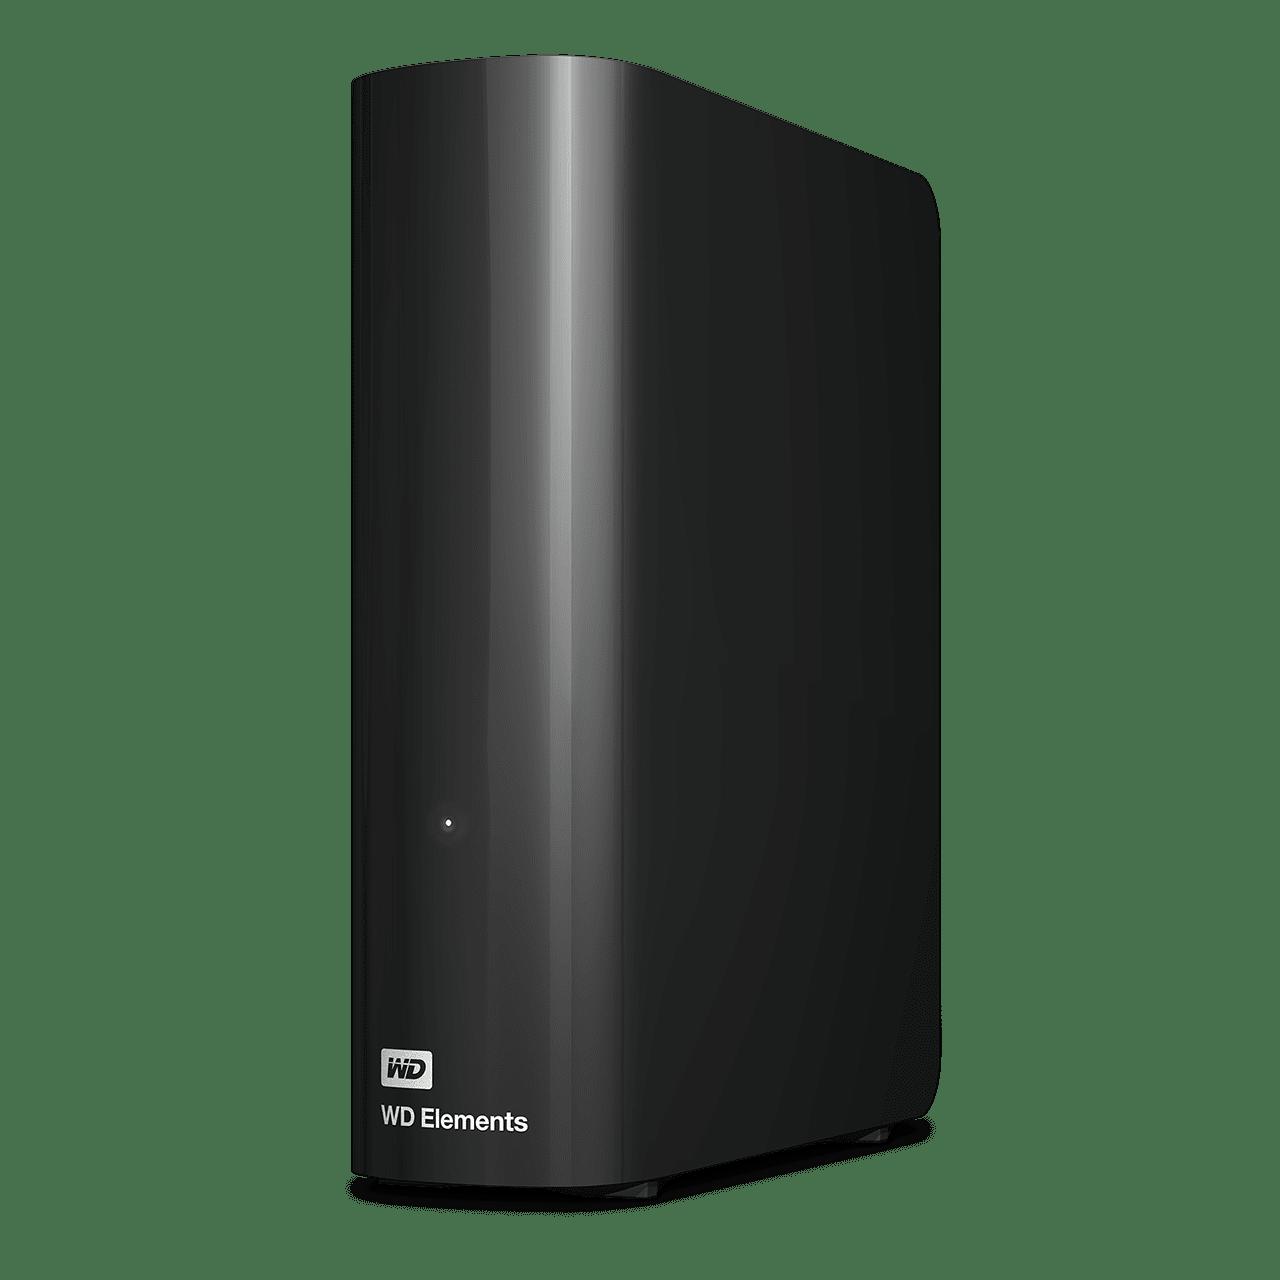 8TB WD Elements $123 w/ Edu or Recycling discount ($15.4/TB) $123.25